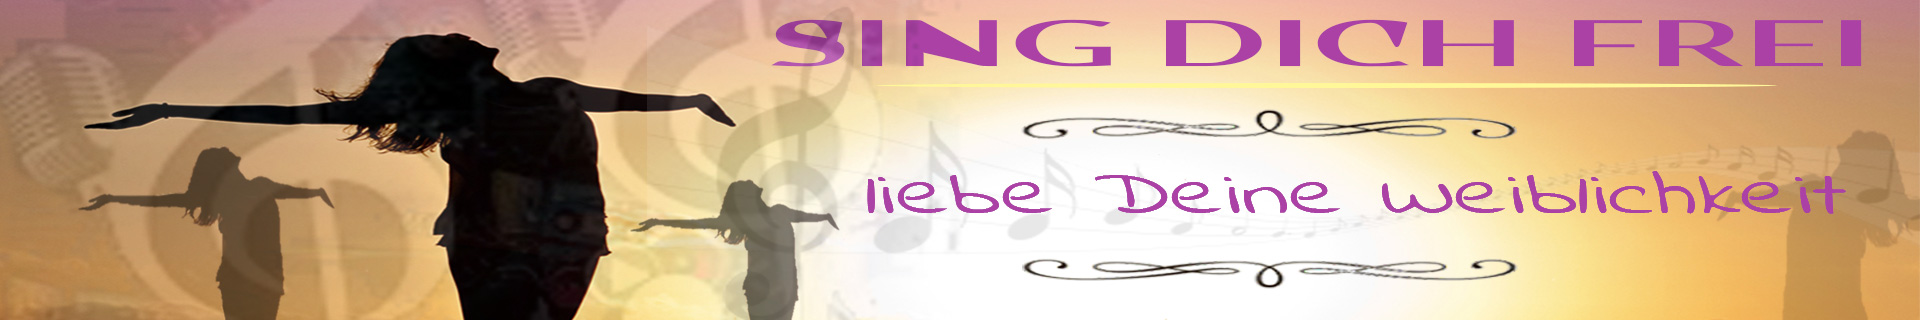 Sing Dich Frei